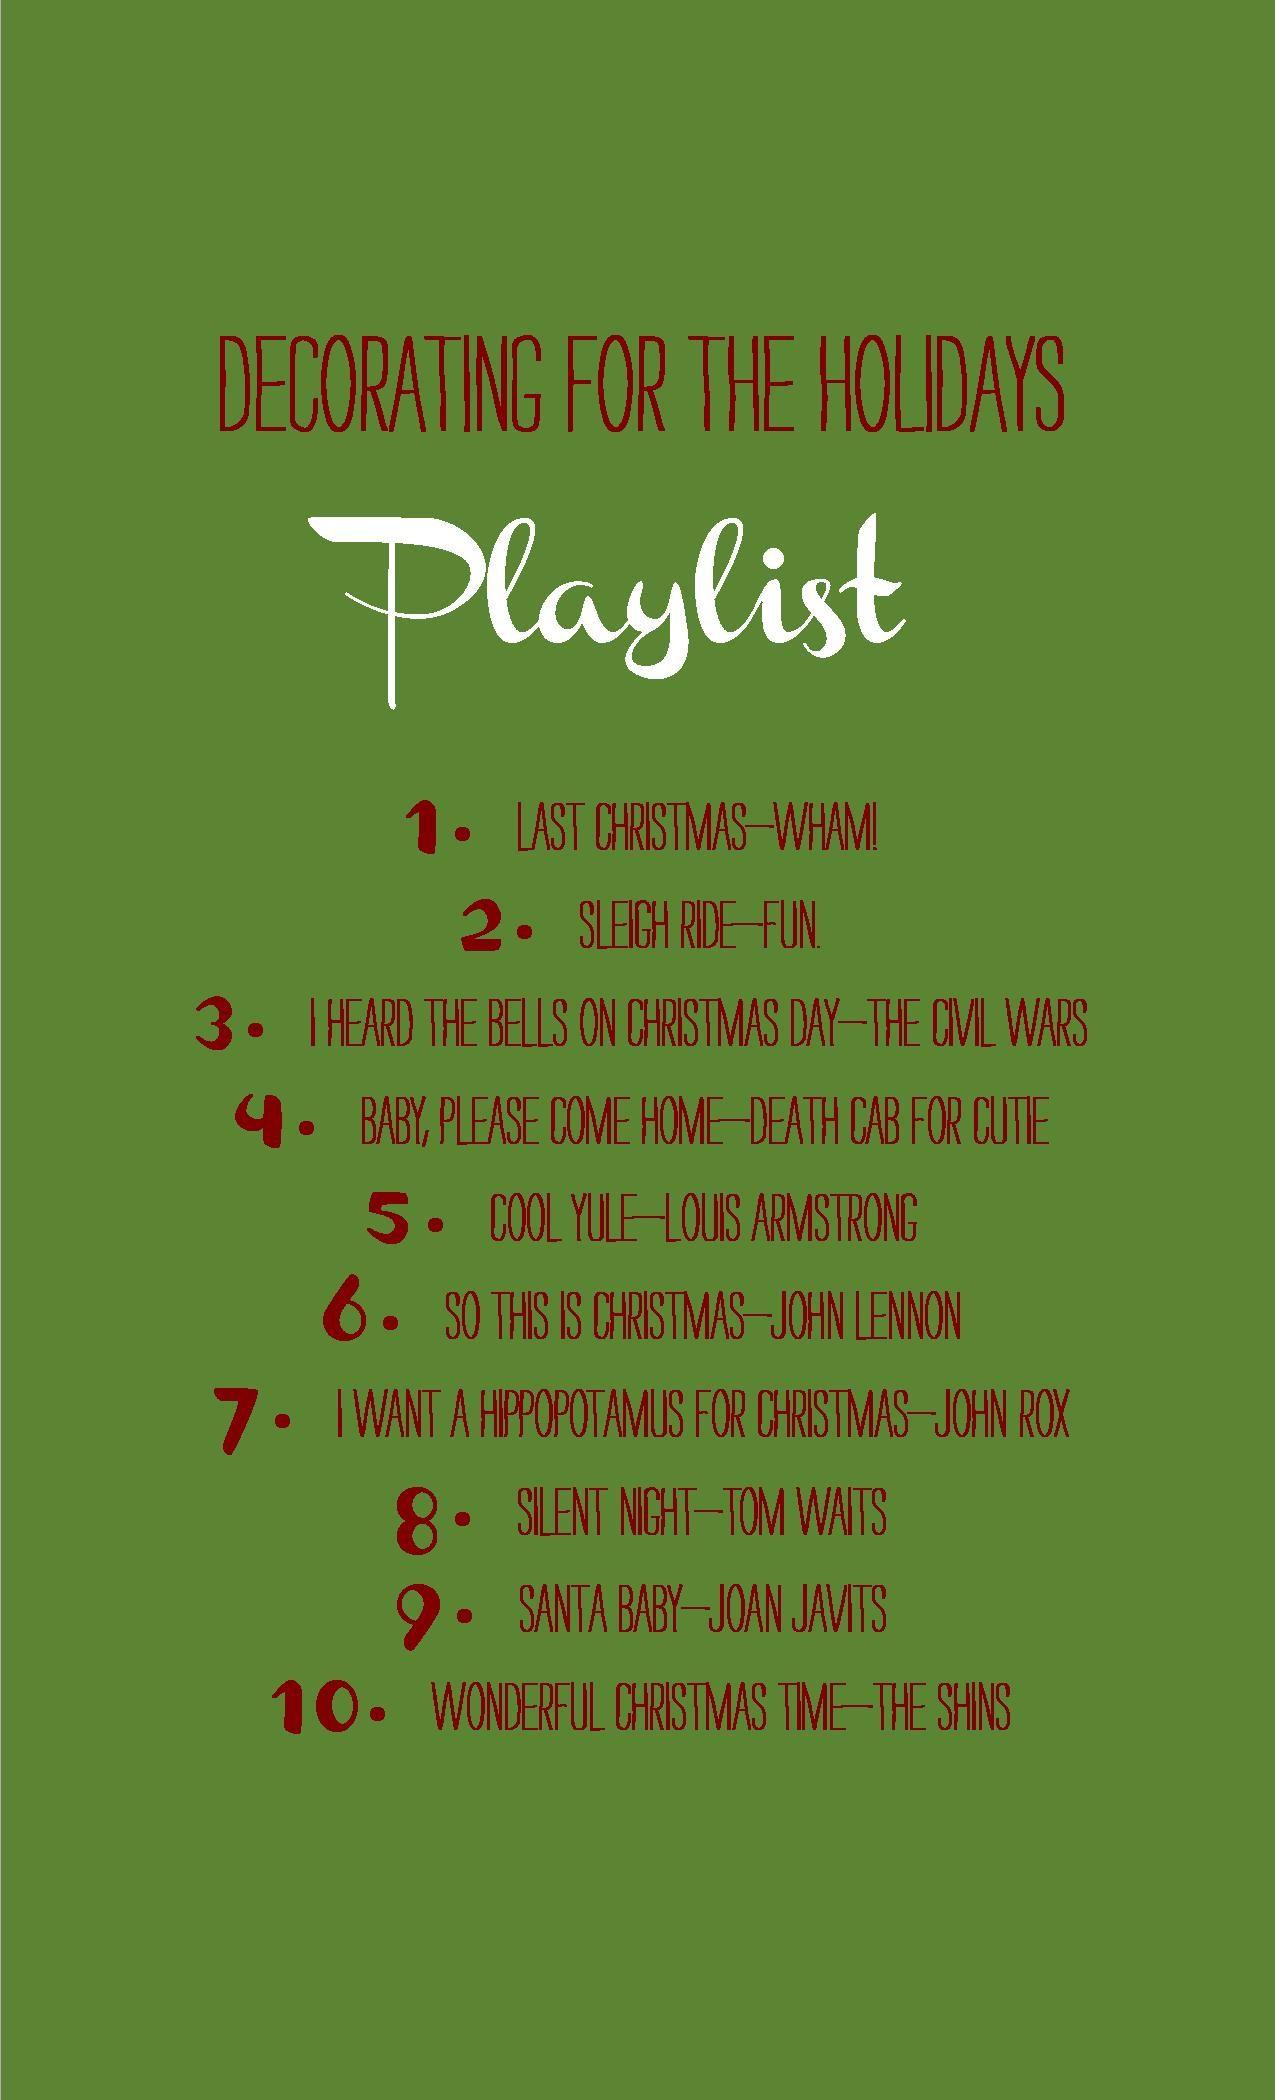 Holiday playlist via This Is The Life. Christmas